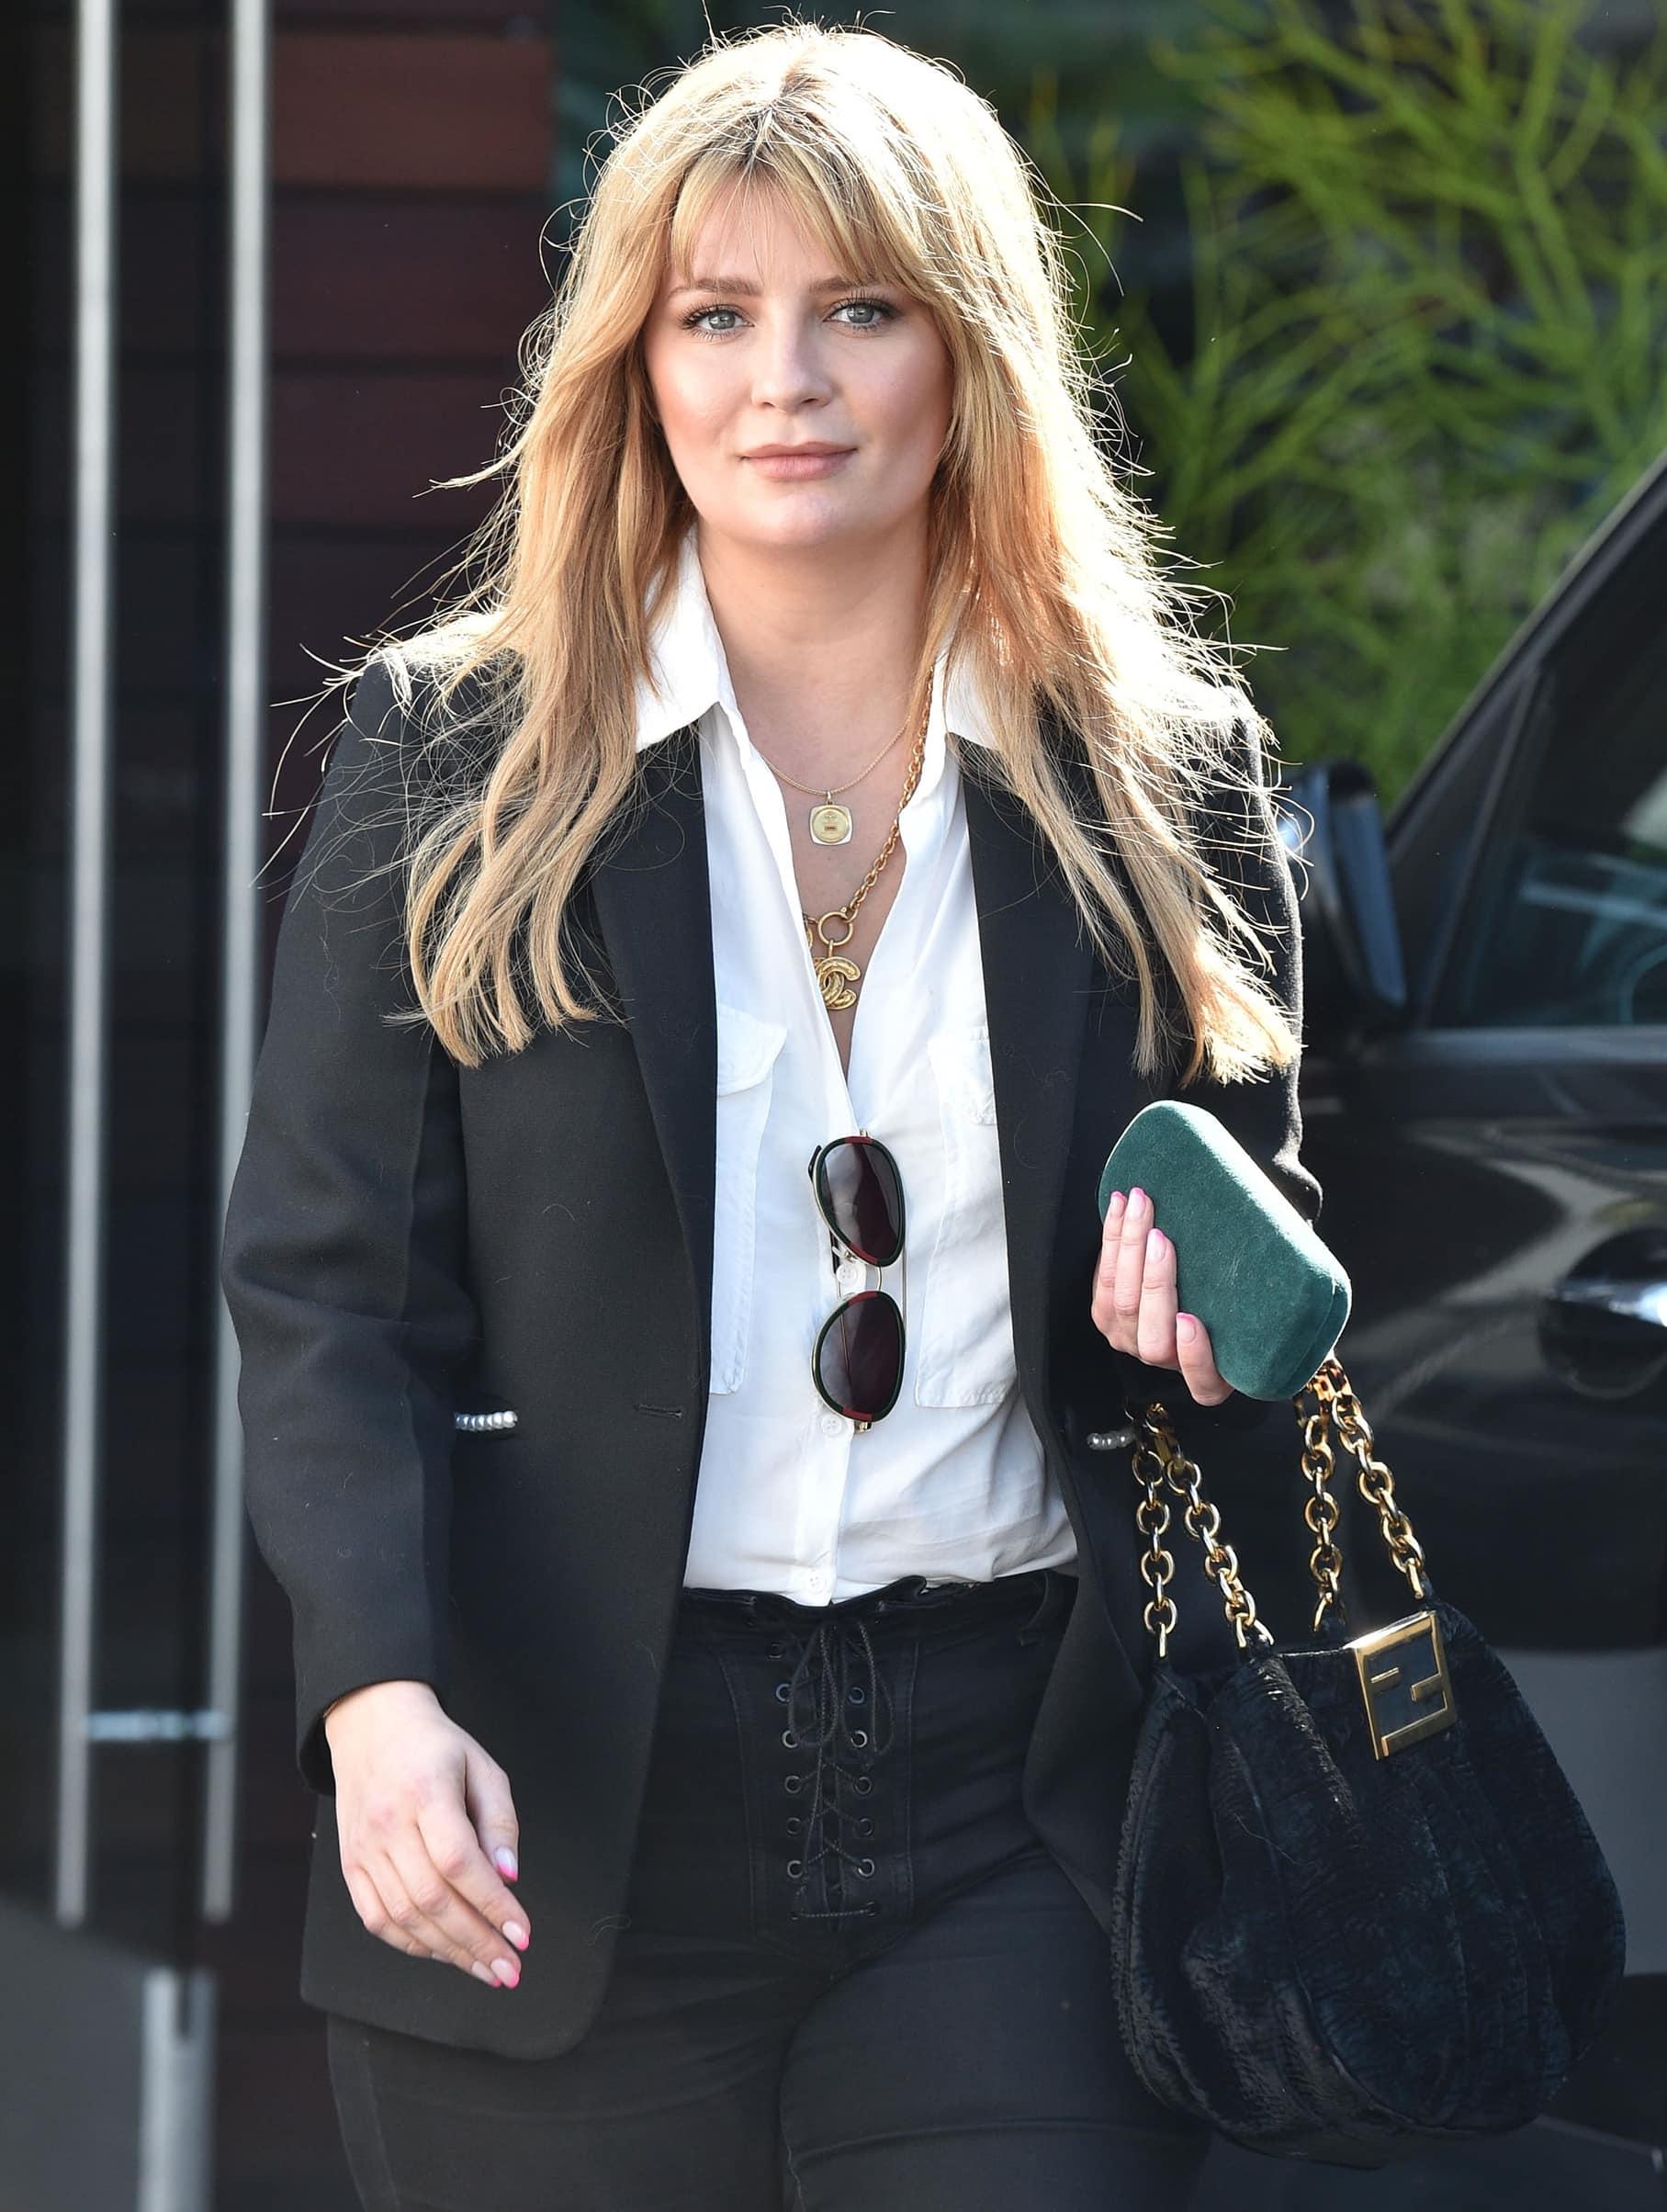 Mischa Barton leaving a meeting in Santa Monica